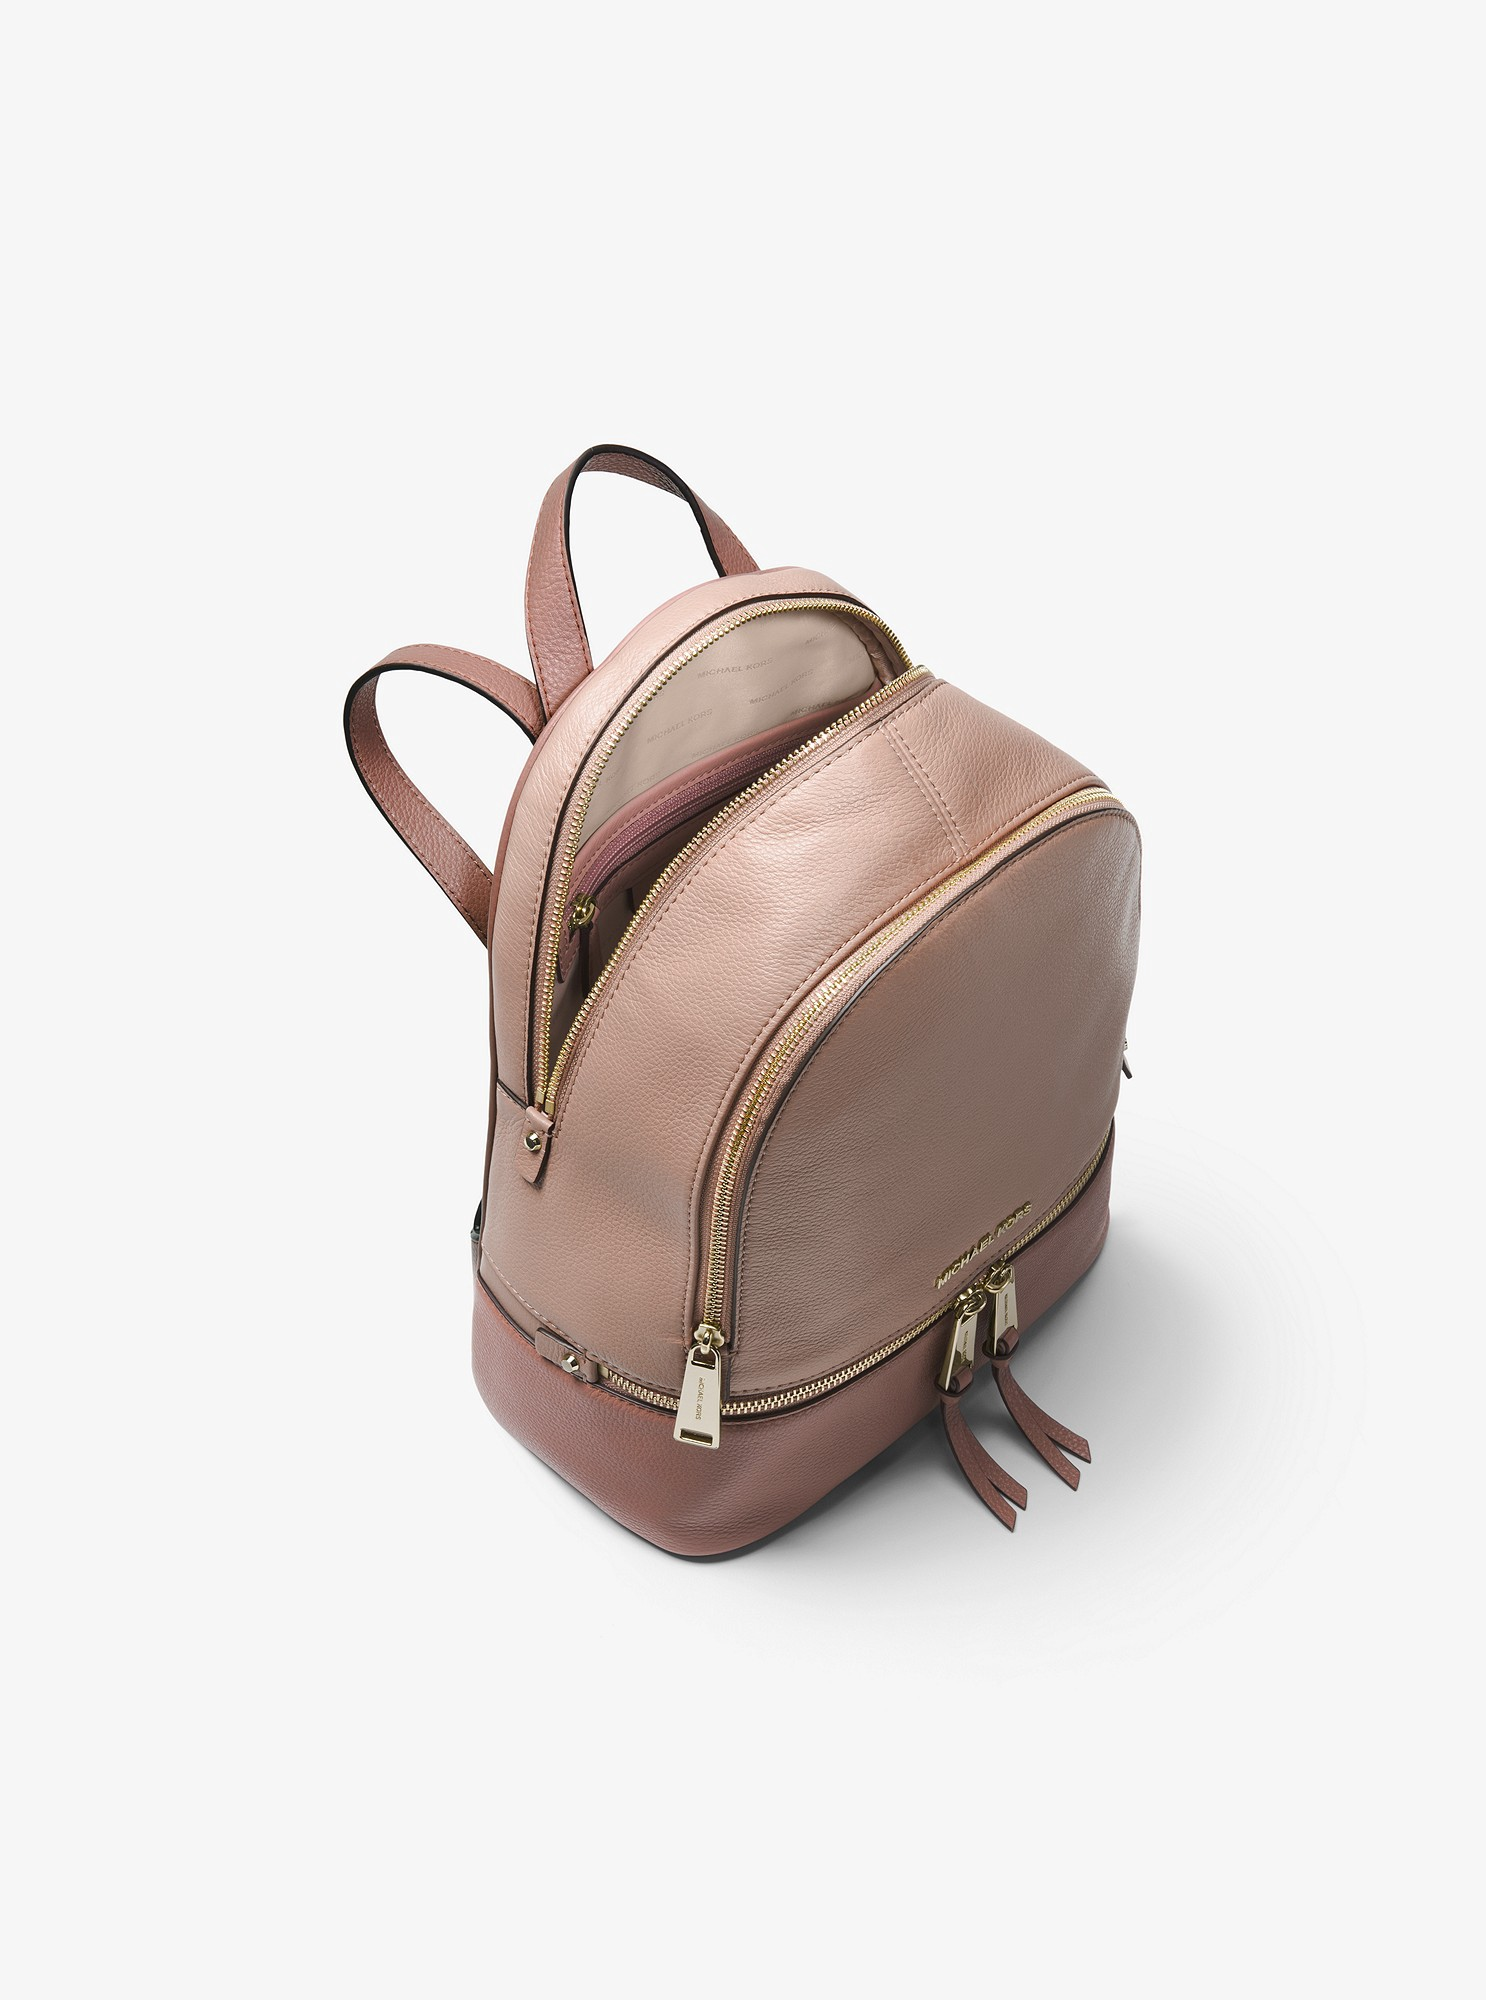 1a7917e942d2 Michael Kors Rhea Medium Color-Block Pebbled Leather Backpack - Fawn Dstyrse